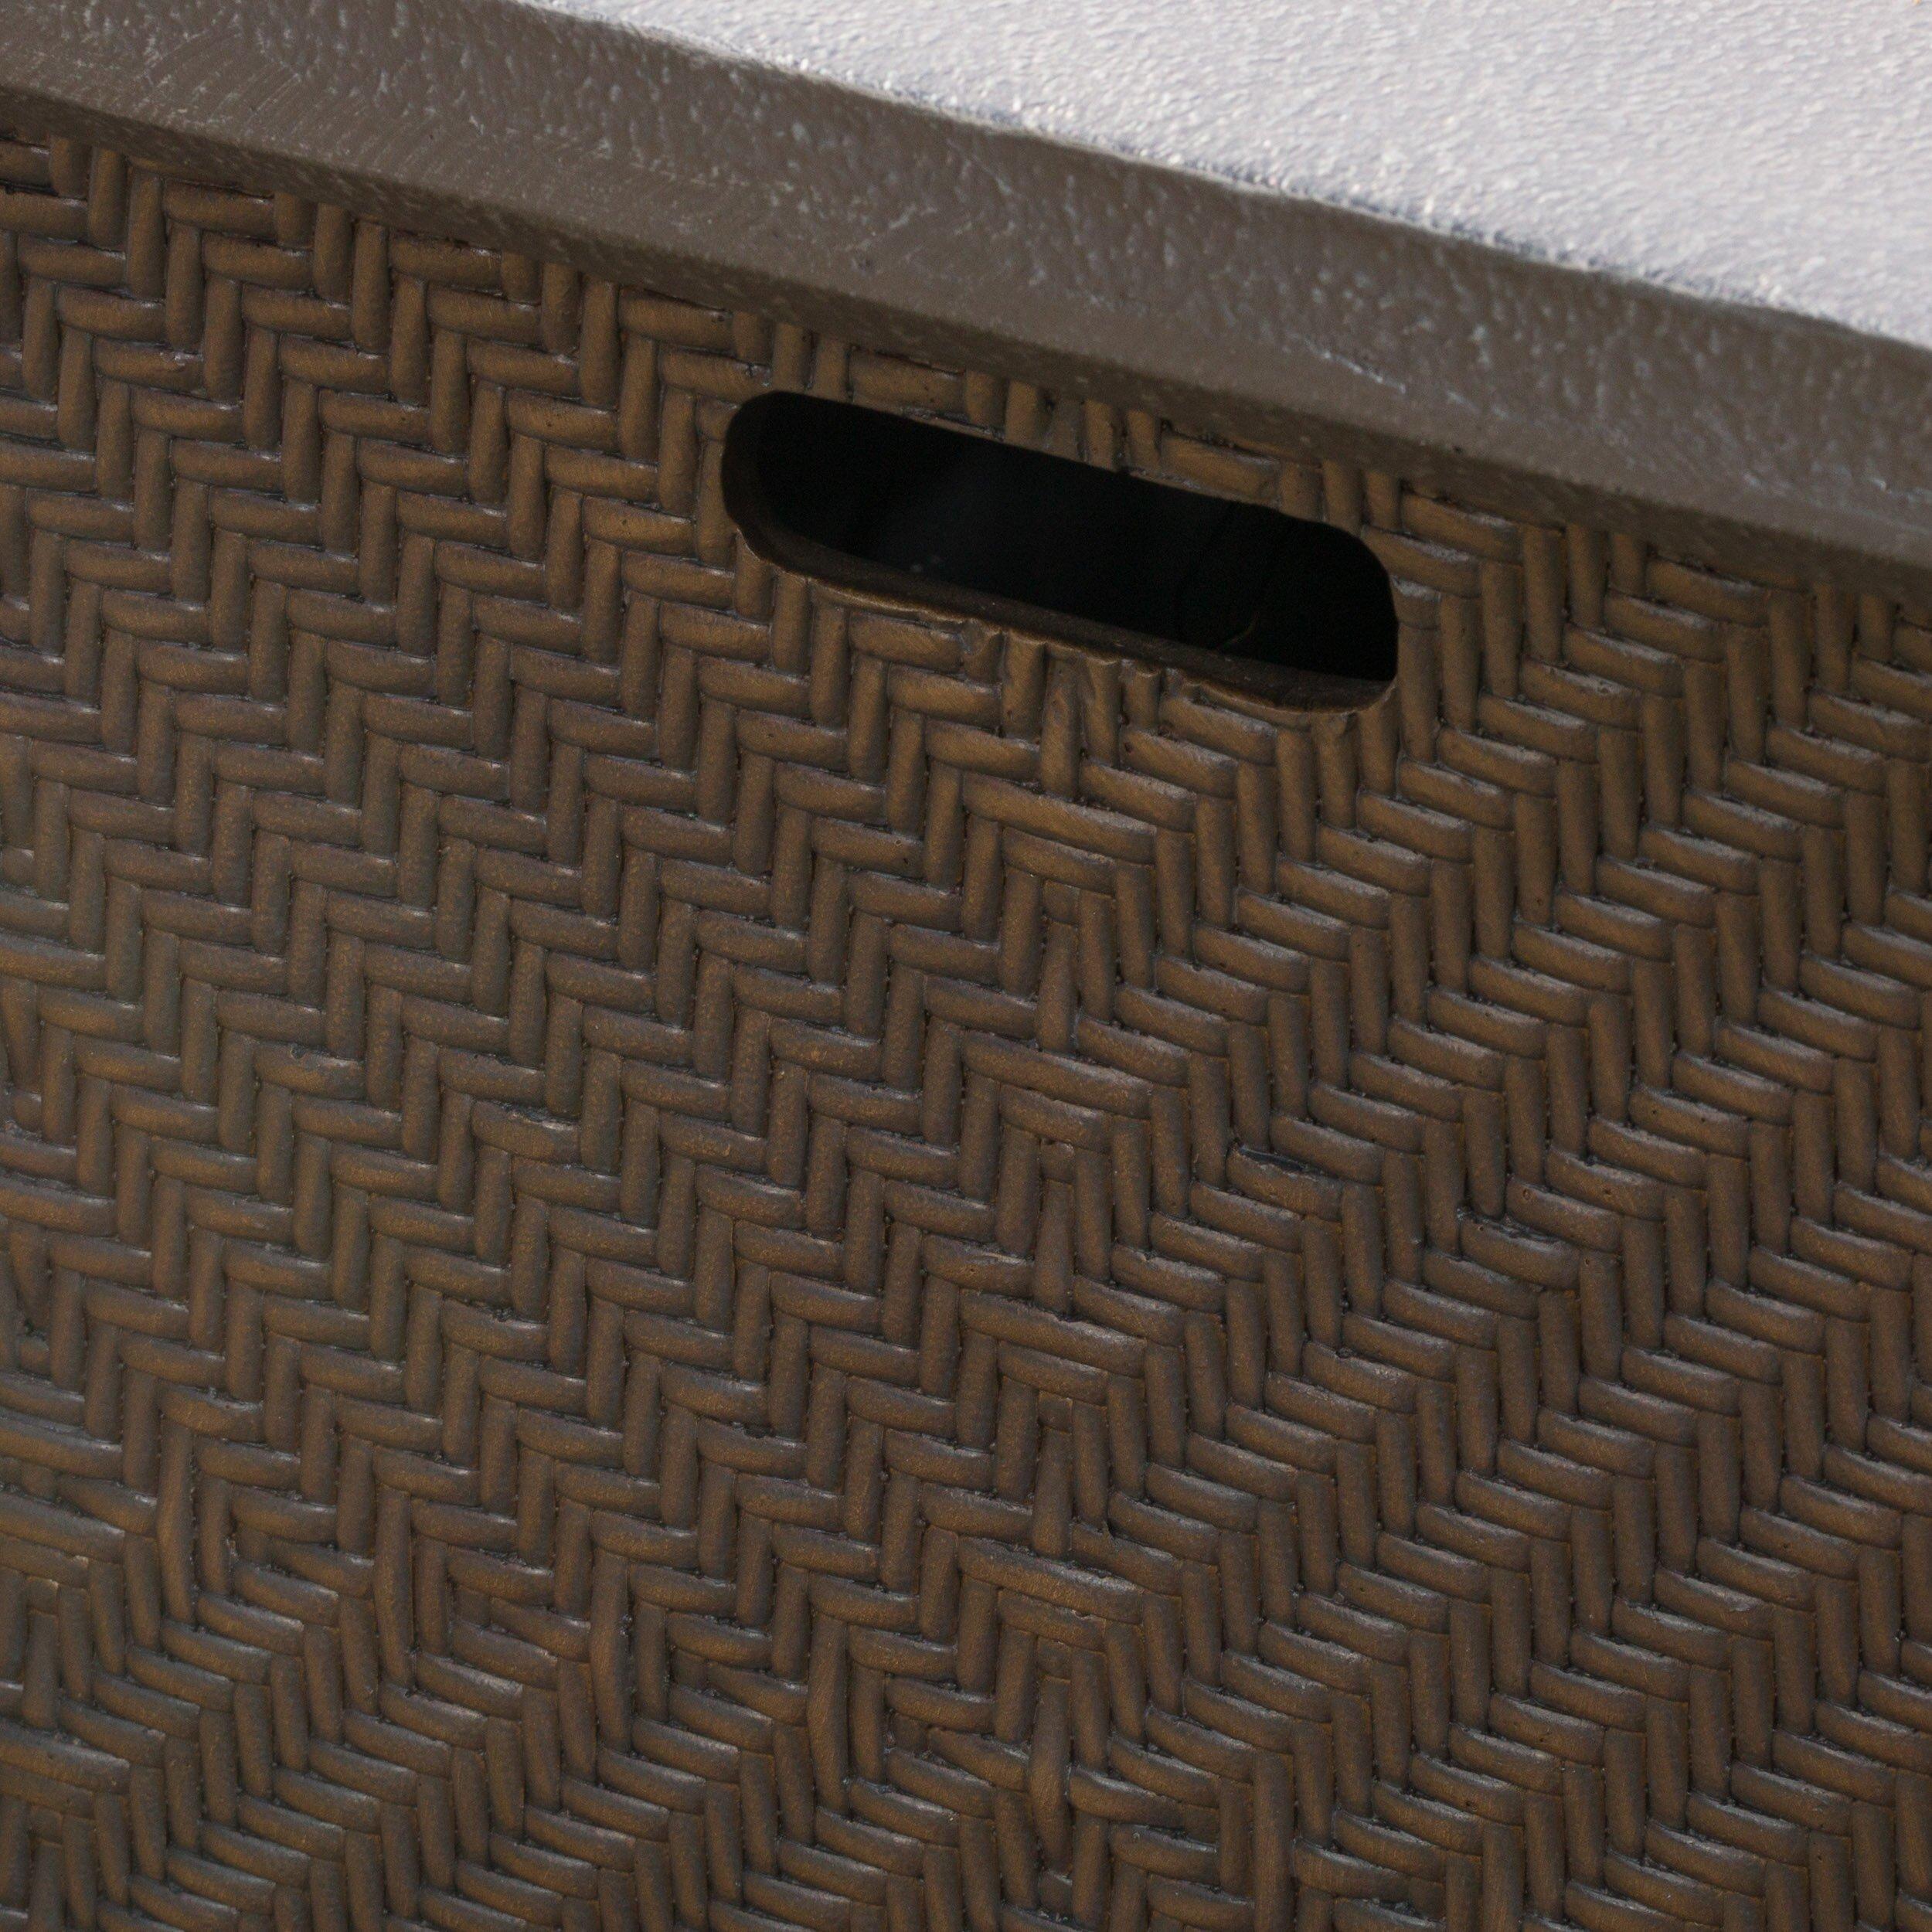 ... Heating ... Propane Outdoor Fireplaces Home Loft Concept SKU: NFN4235